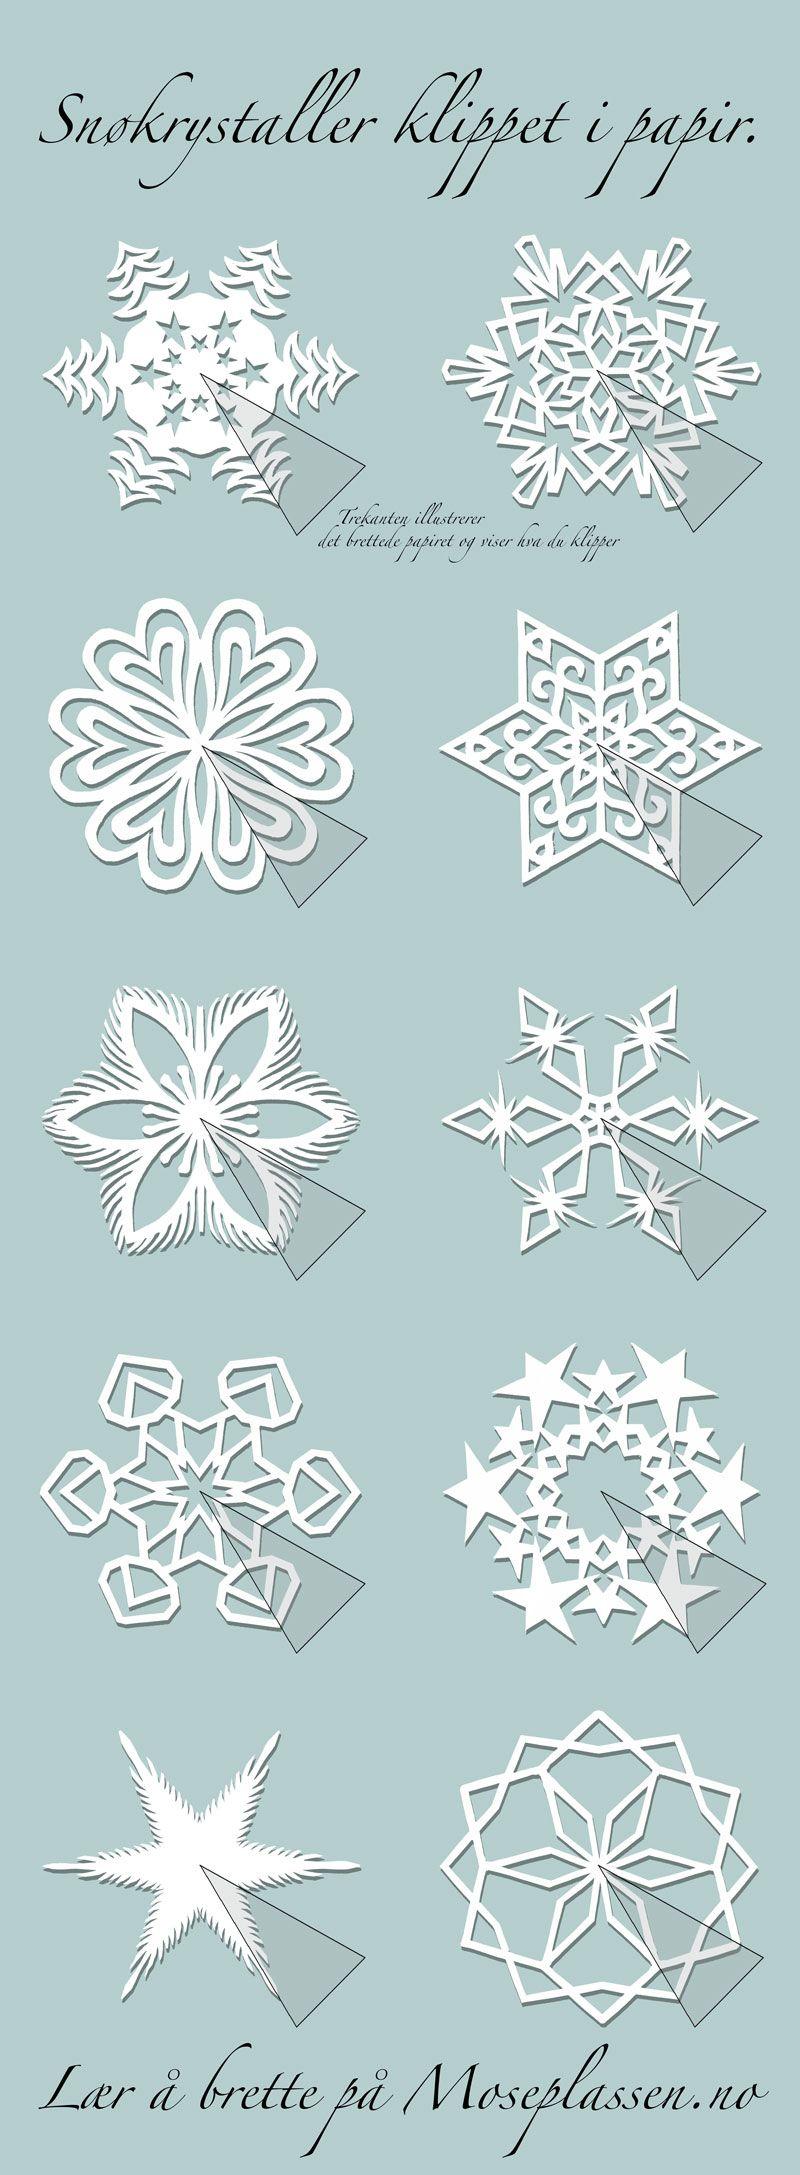 Paper snowflakes and other kirigami patterns. | ideas para navidad ...